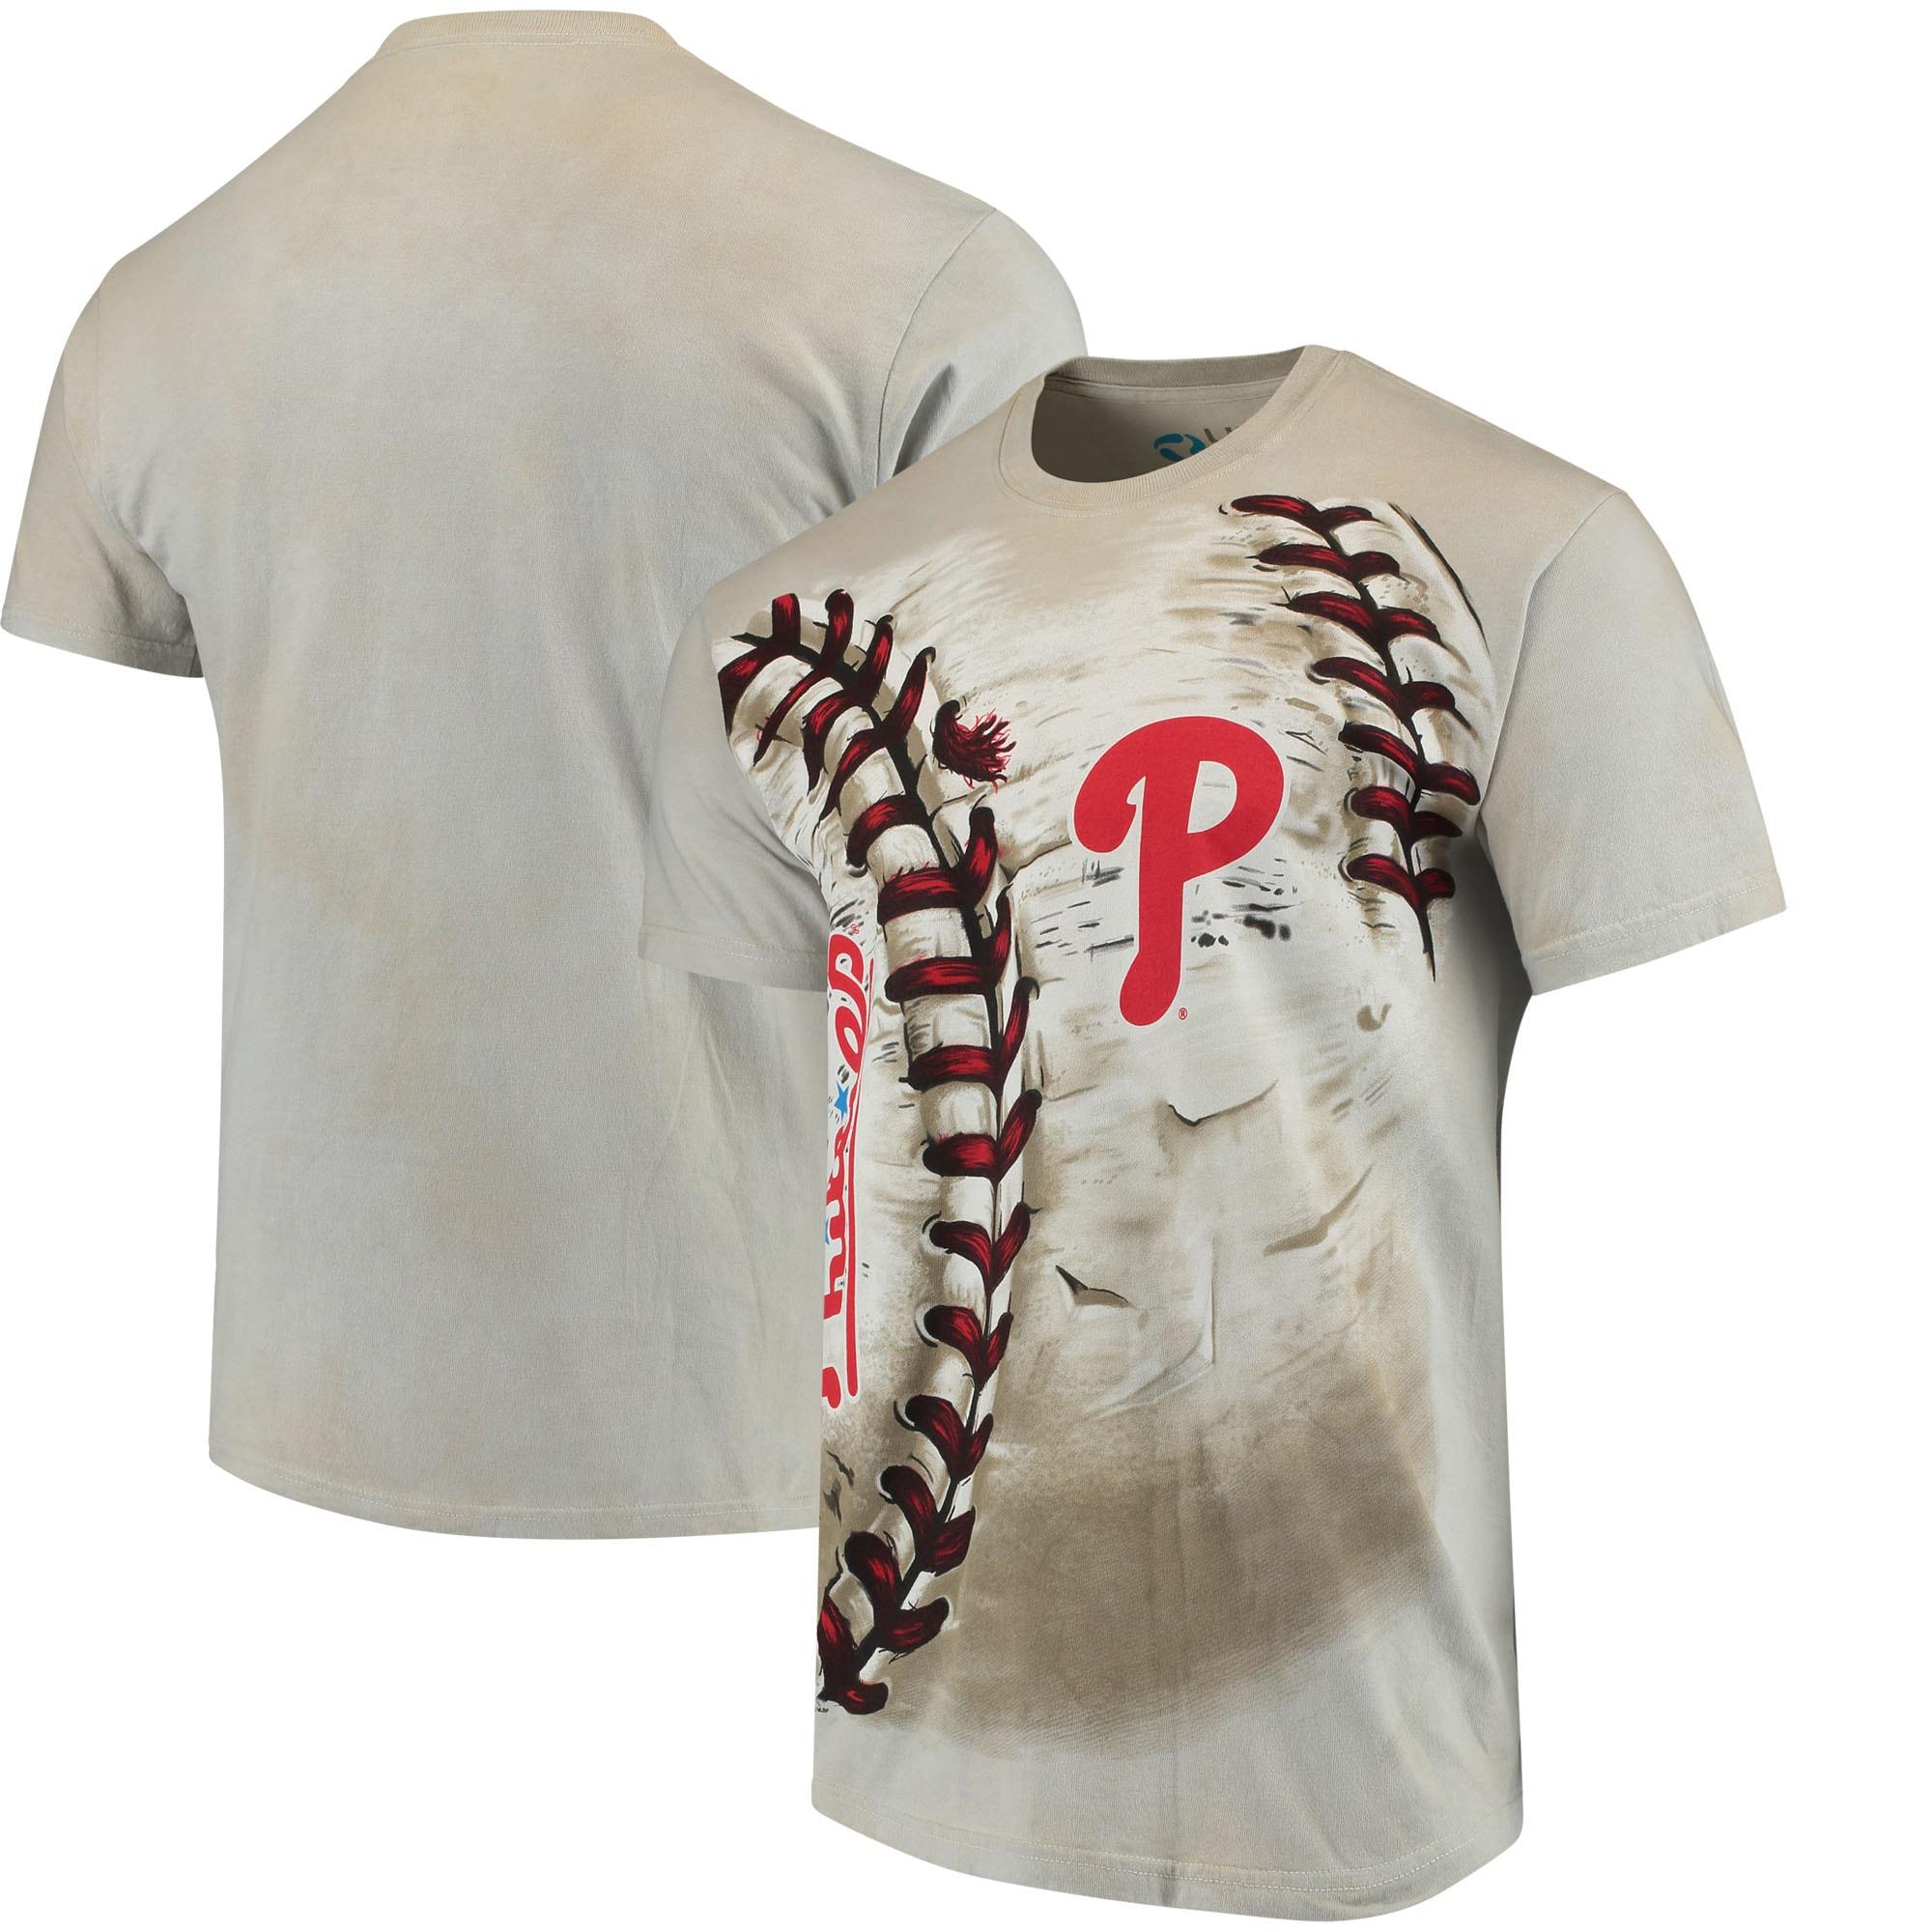 Philadelphia Phillies Hardball Tie-Dye T- Shirt - Cream